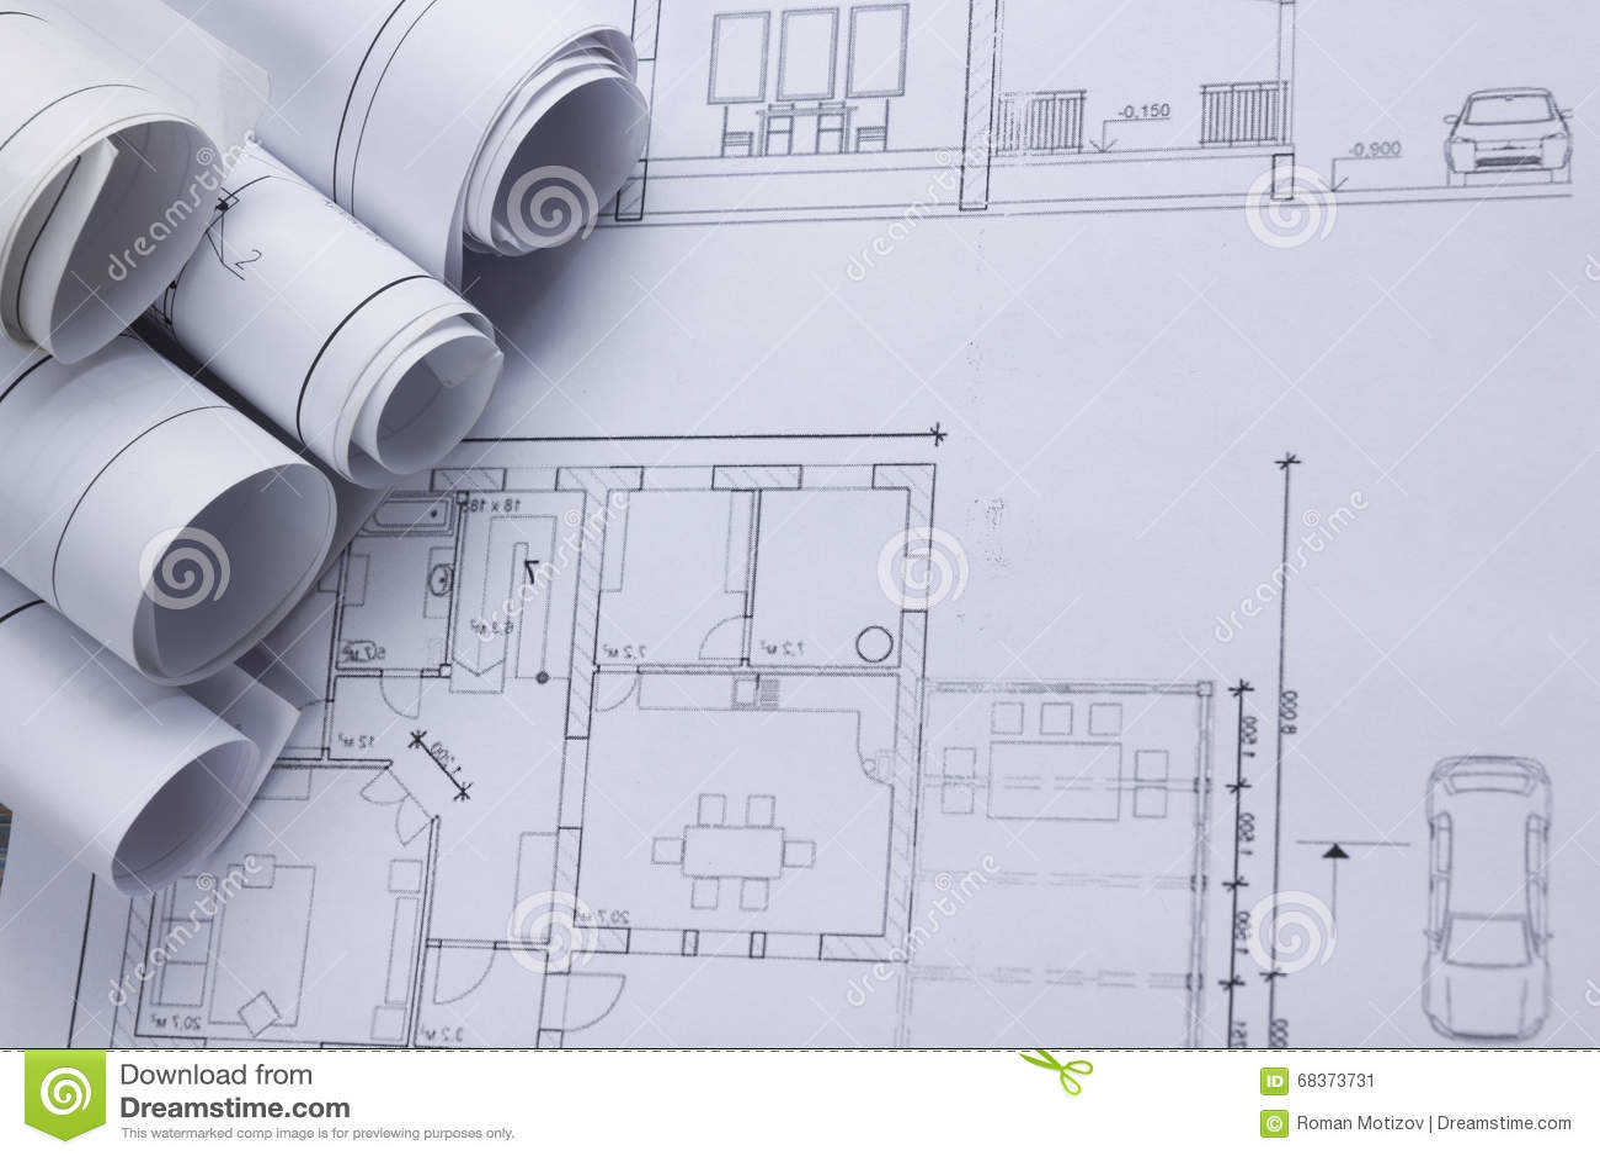 architect worplace top view architectural project blueprints blueprint rolls on plans construction